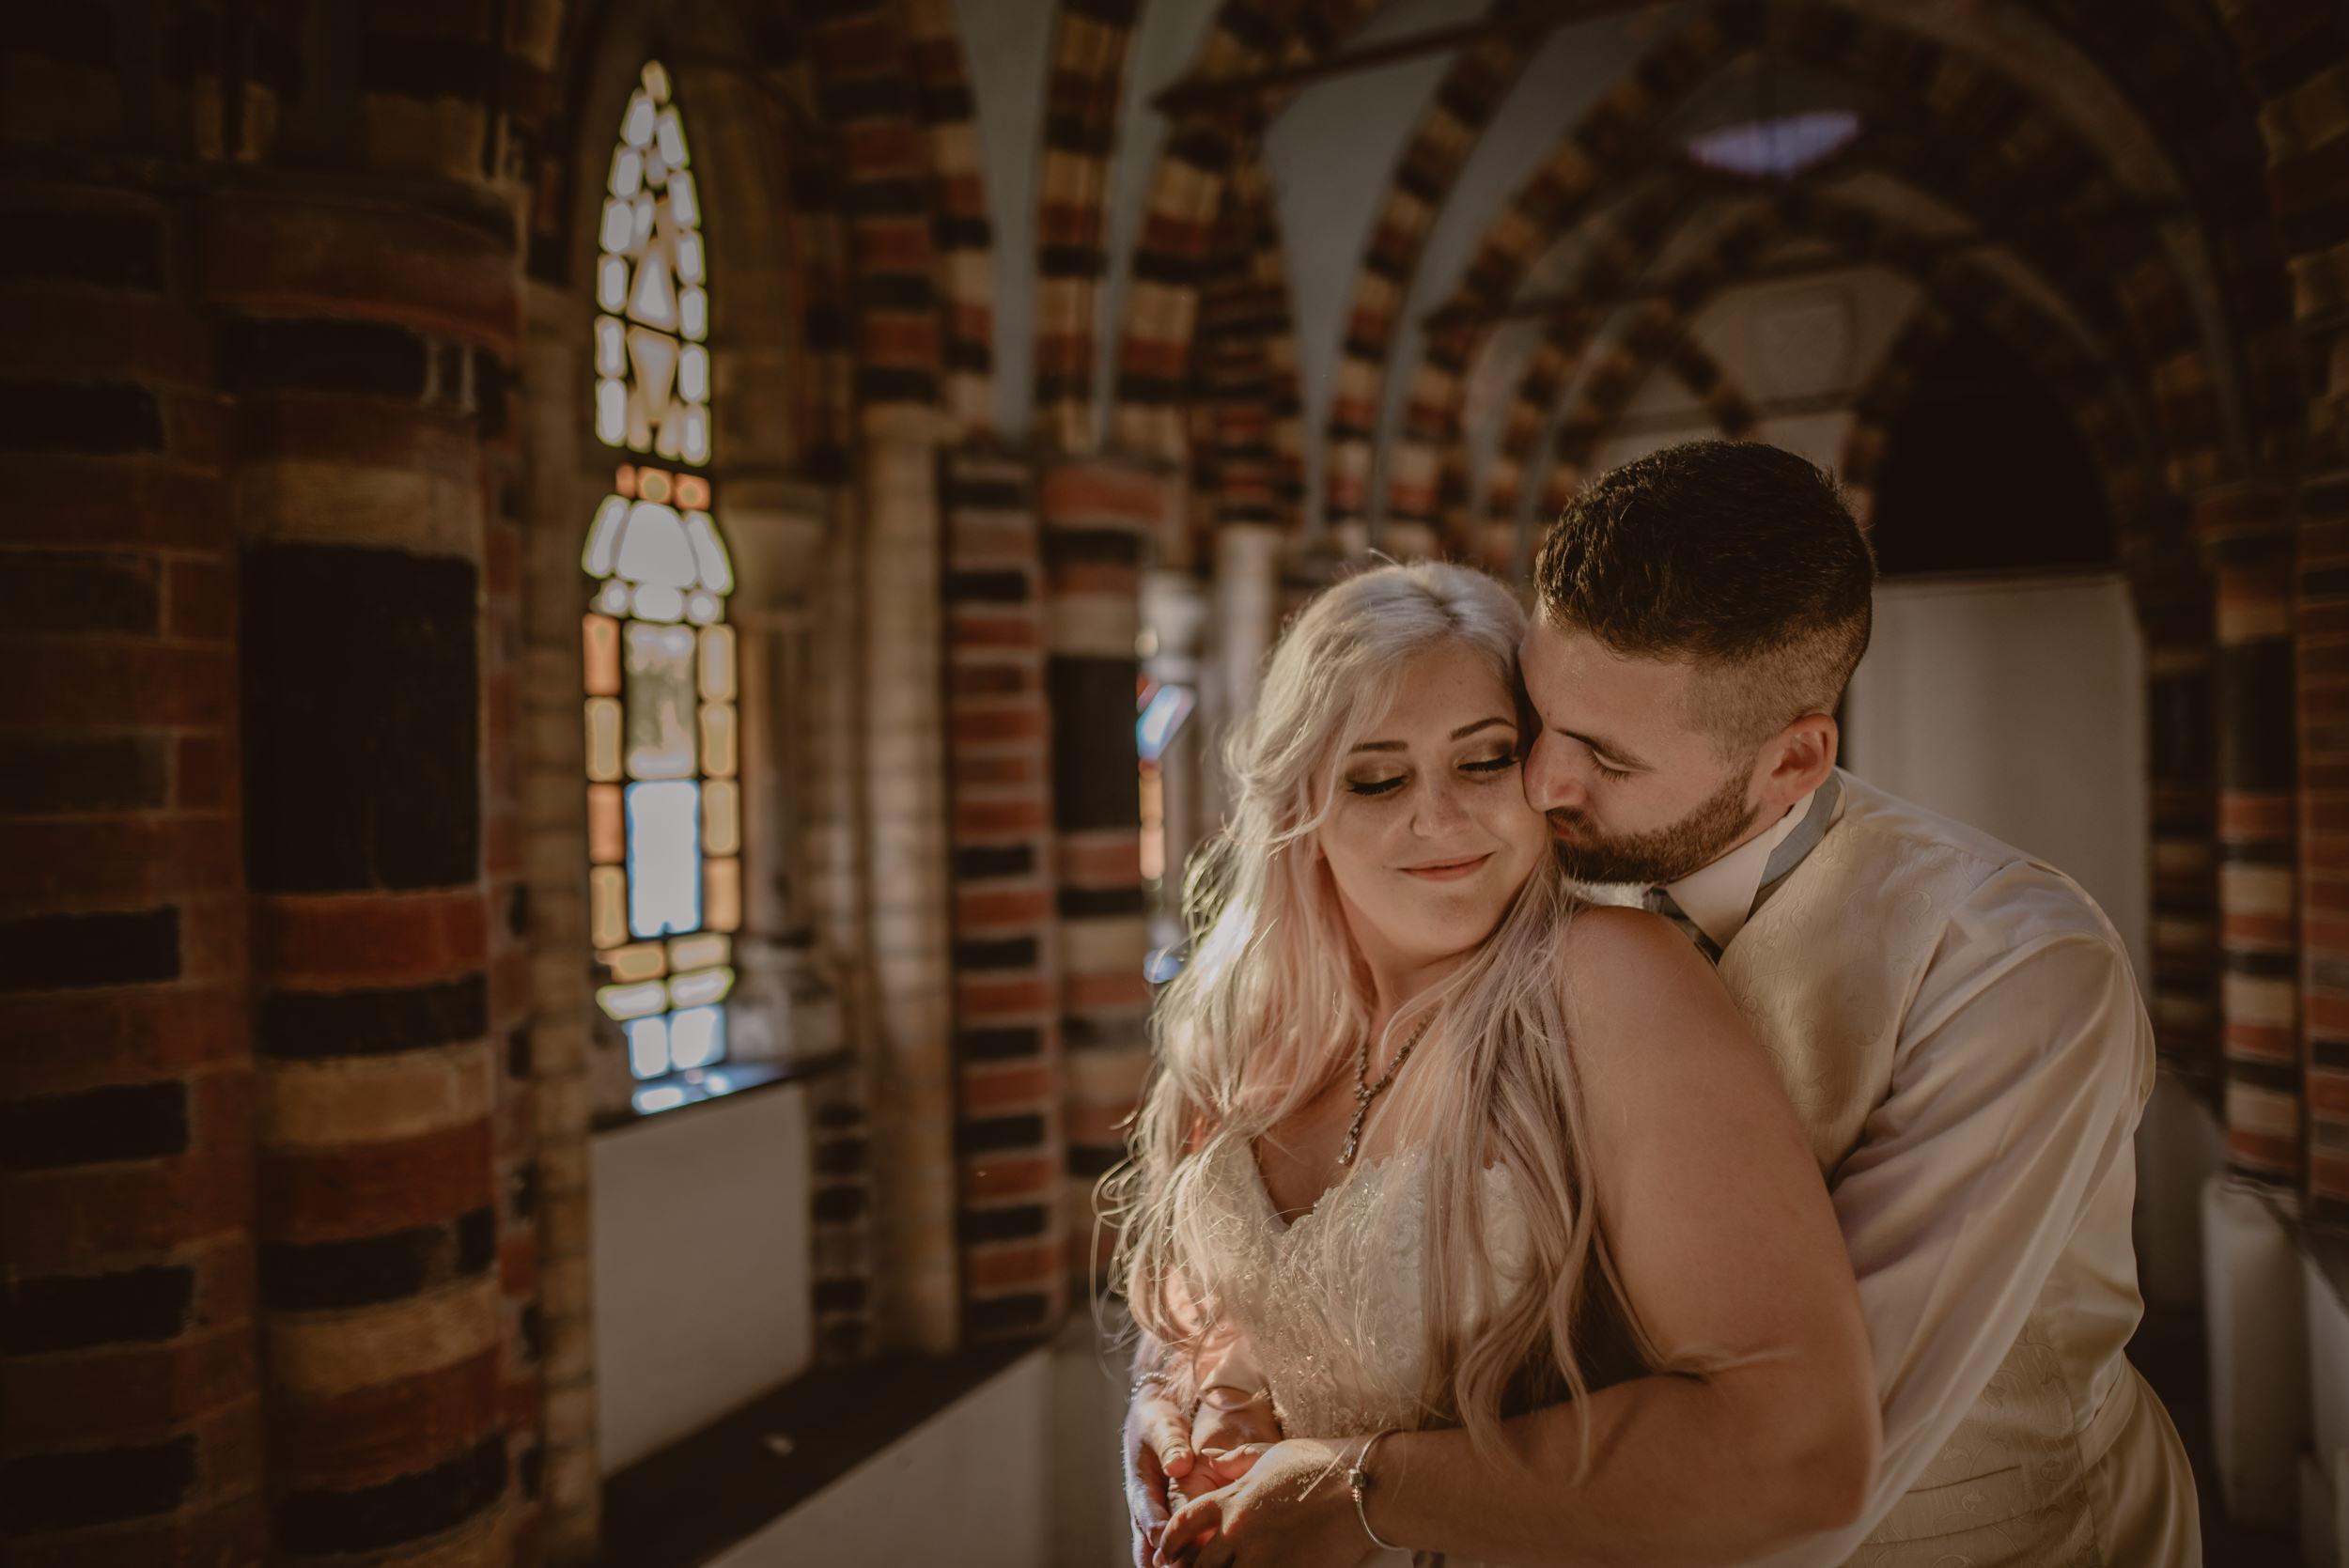 Rachel-and-James-Wedding-Horsley-Towers-State-Manu-Mendoza-Wedding-Photography-485.jpg